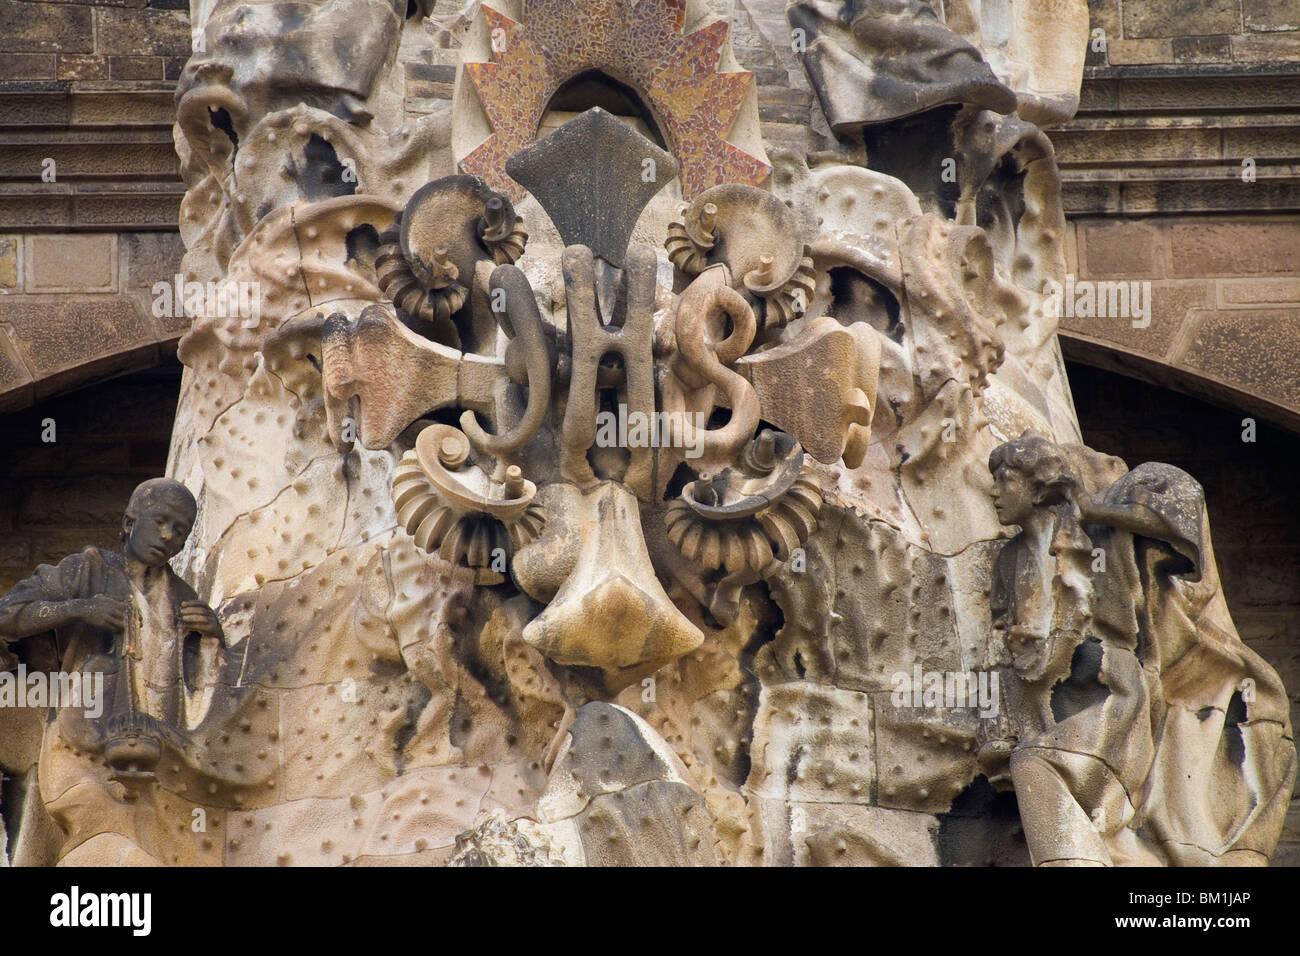 Façade detail, Sagrada Familia of Antoni Gaudì, Barcelona, Spain, Europe - Stock Image